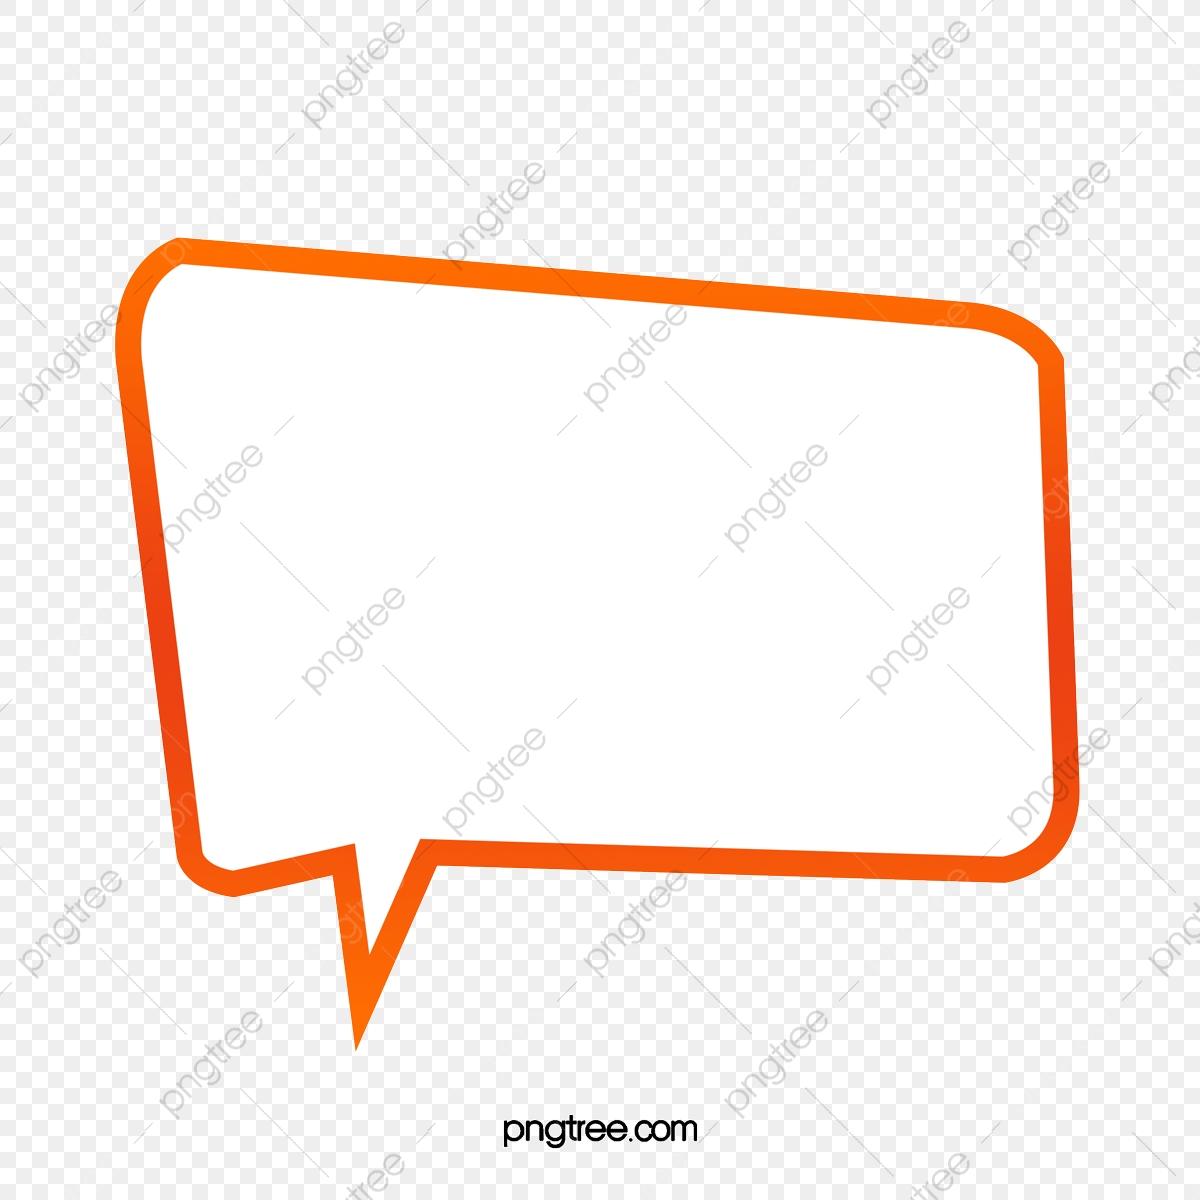 Cartoon Chat Box Material, Cartoon Clipart, Gradient, Chat Box PNG.